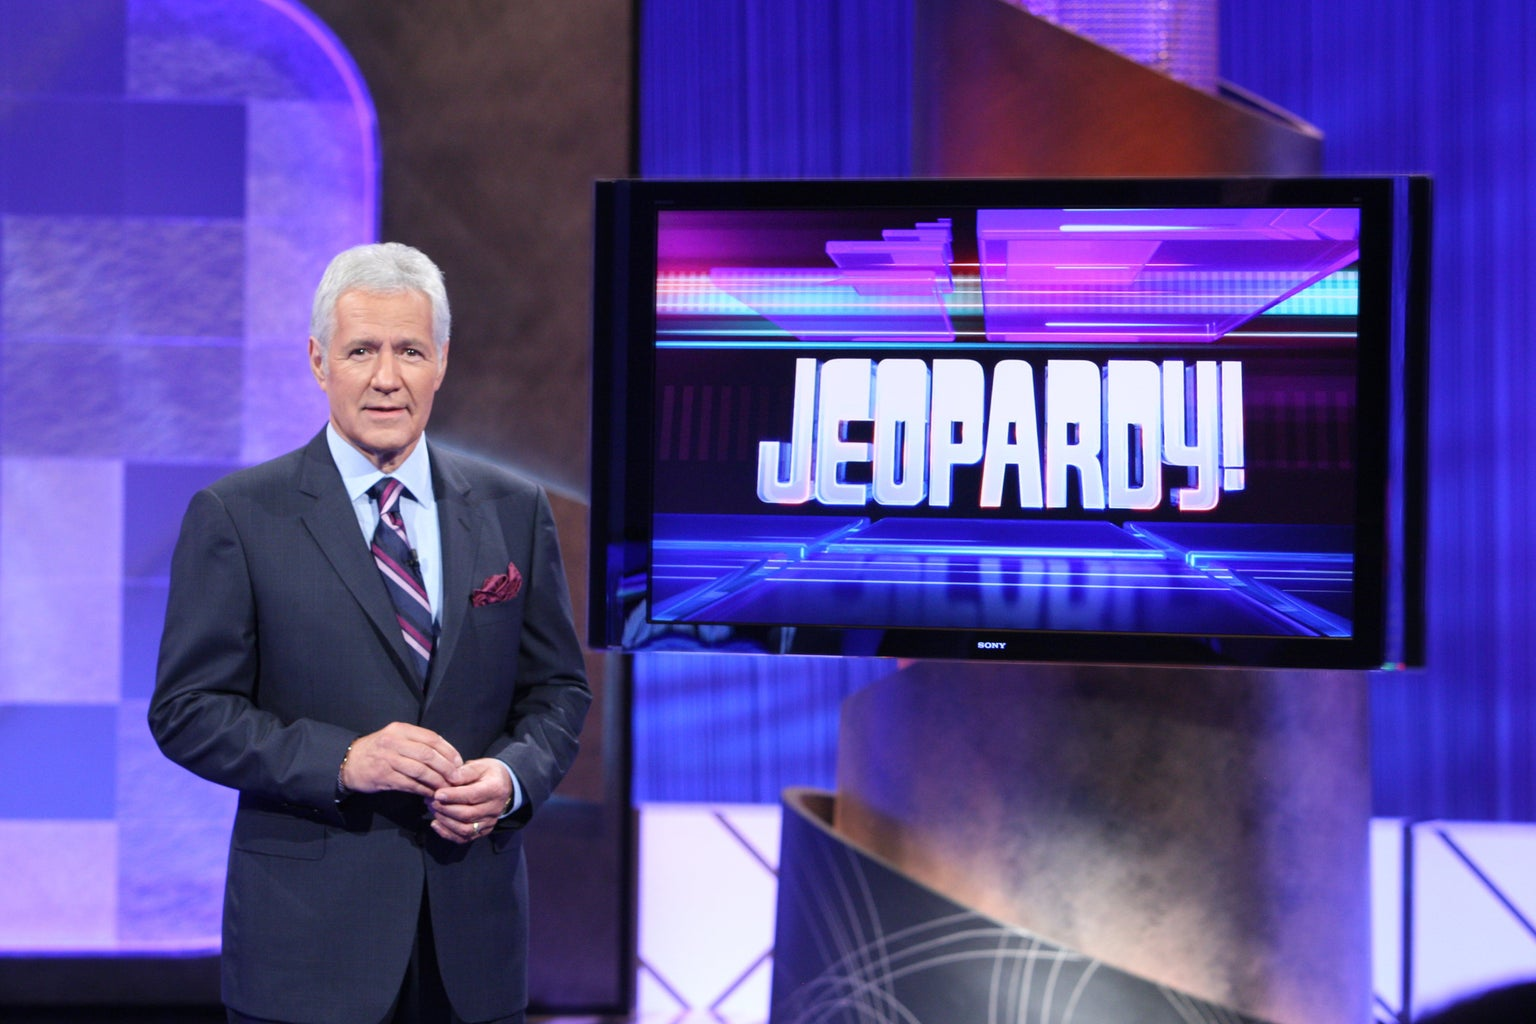 Alex Trebek of Jeopardy